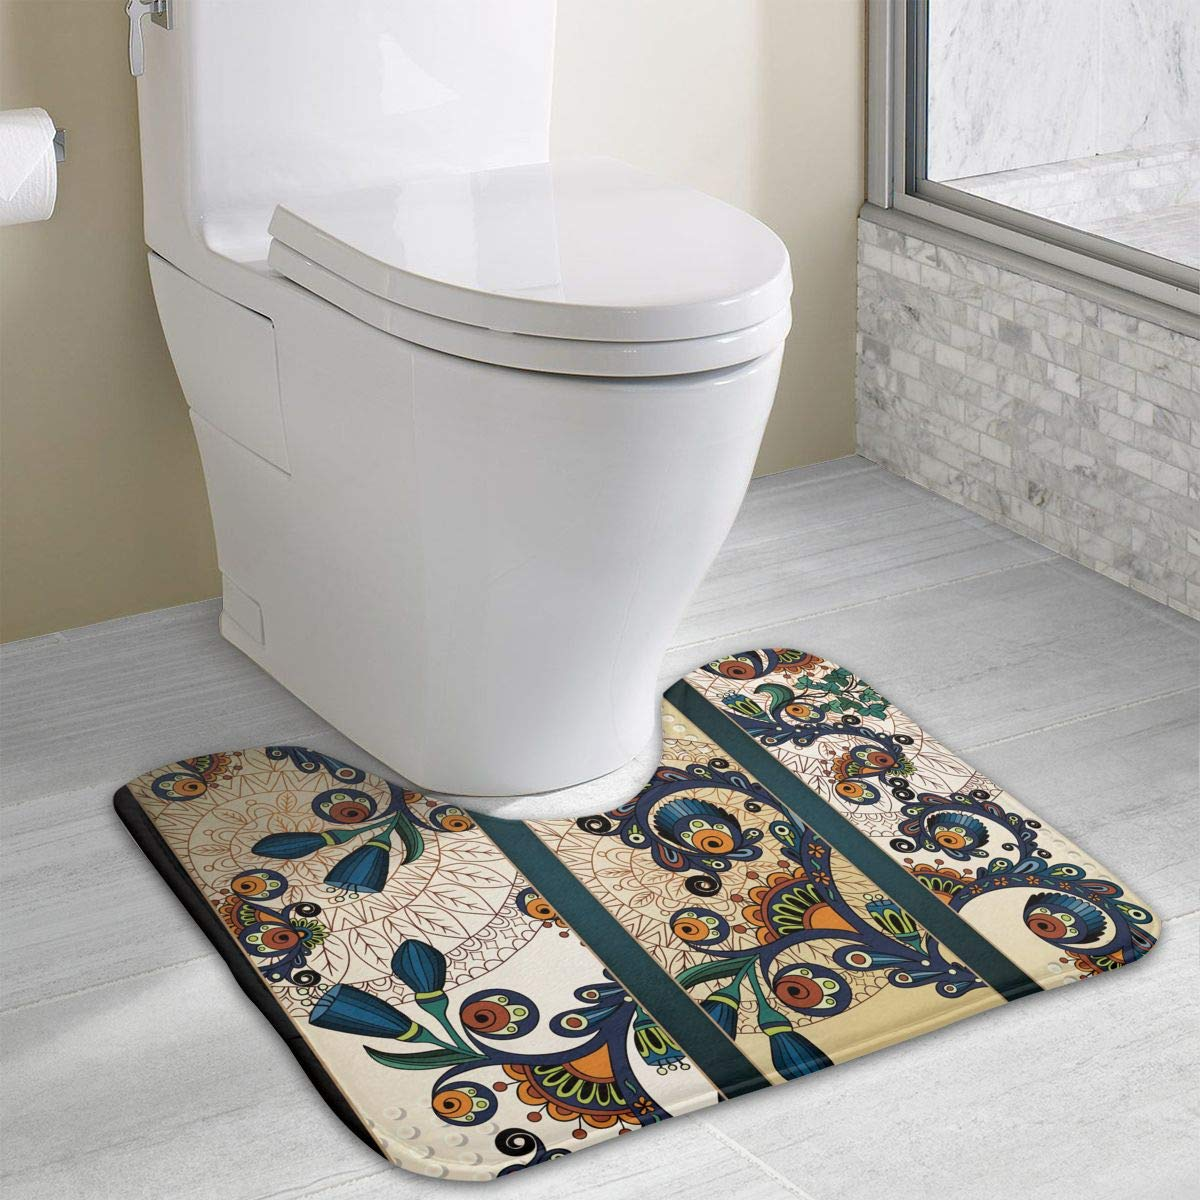 Luckytagy paisley batik floral design ethnic african hand drawn ornament bath rug u shaped toilet floor rug shower mat non slip bathroom carpet 15 8x 19 3